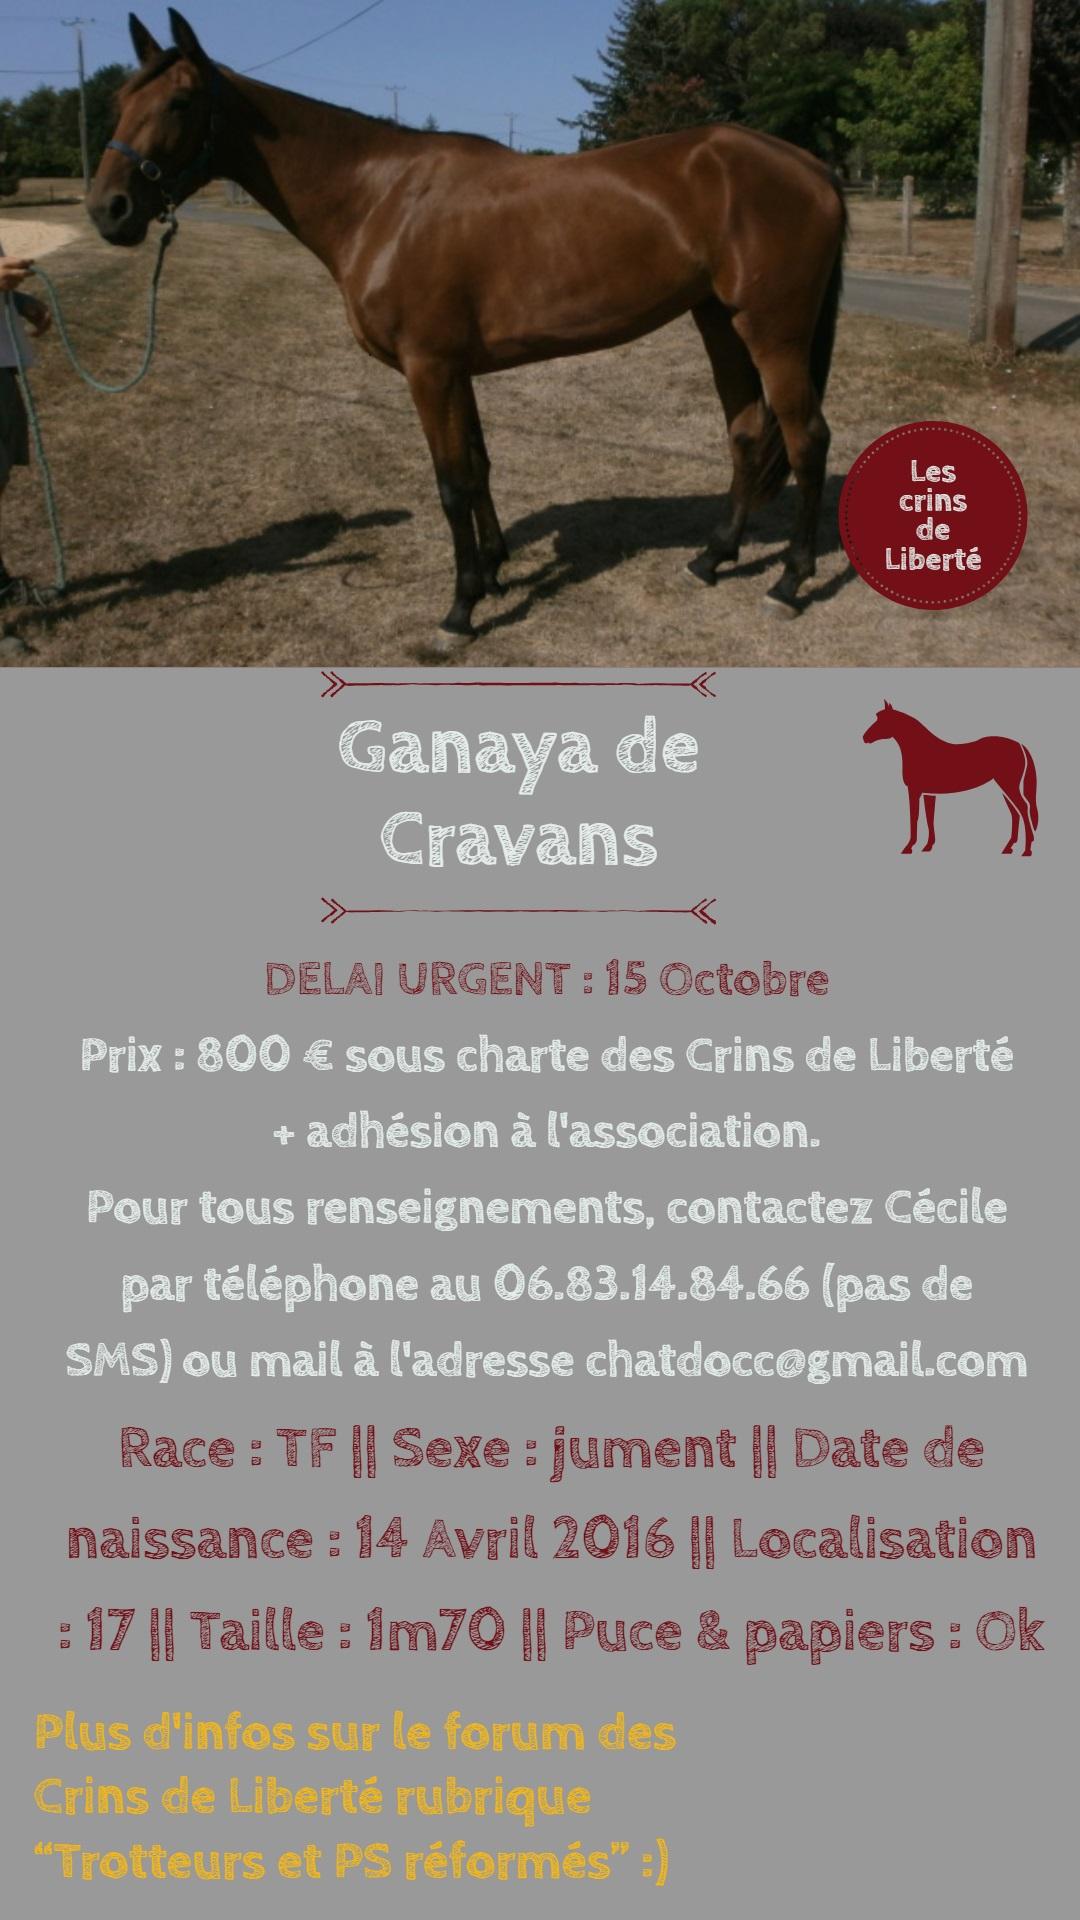 Dpt 17, 3 ans, Ganaya de Cravans, adoptée par Séléna (mars 2019) Fiche_44